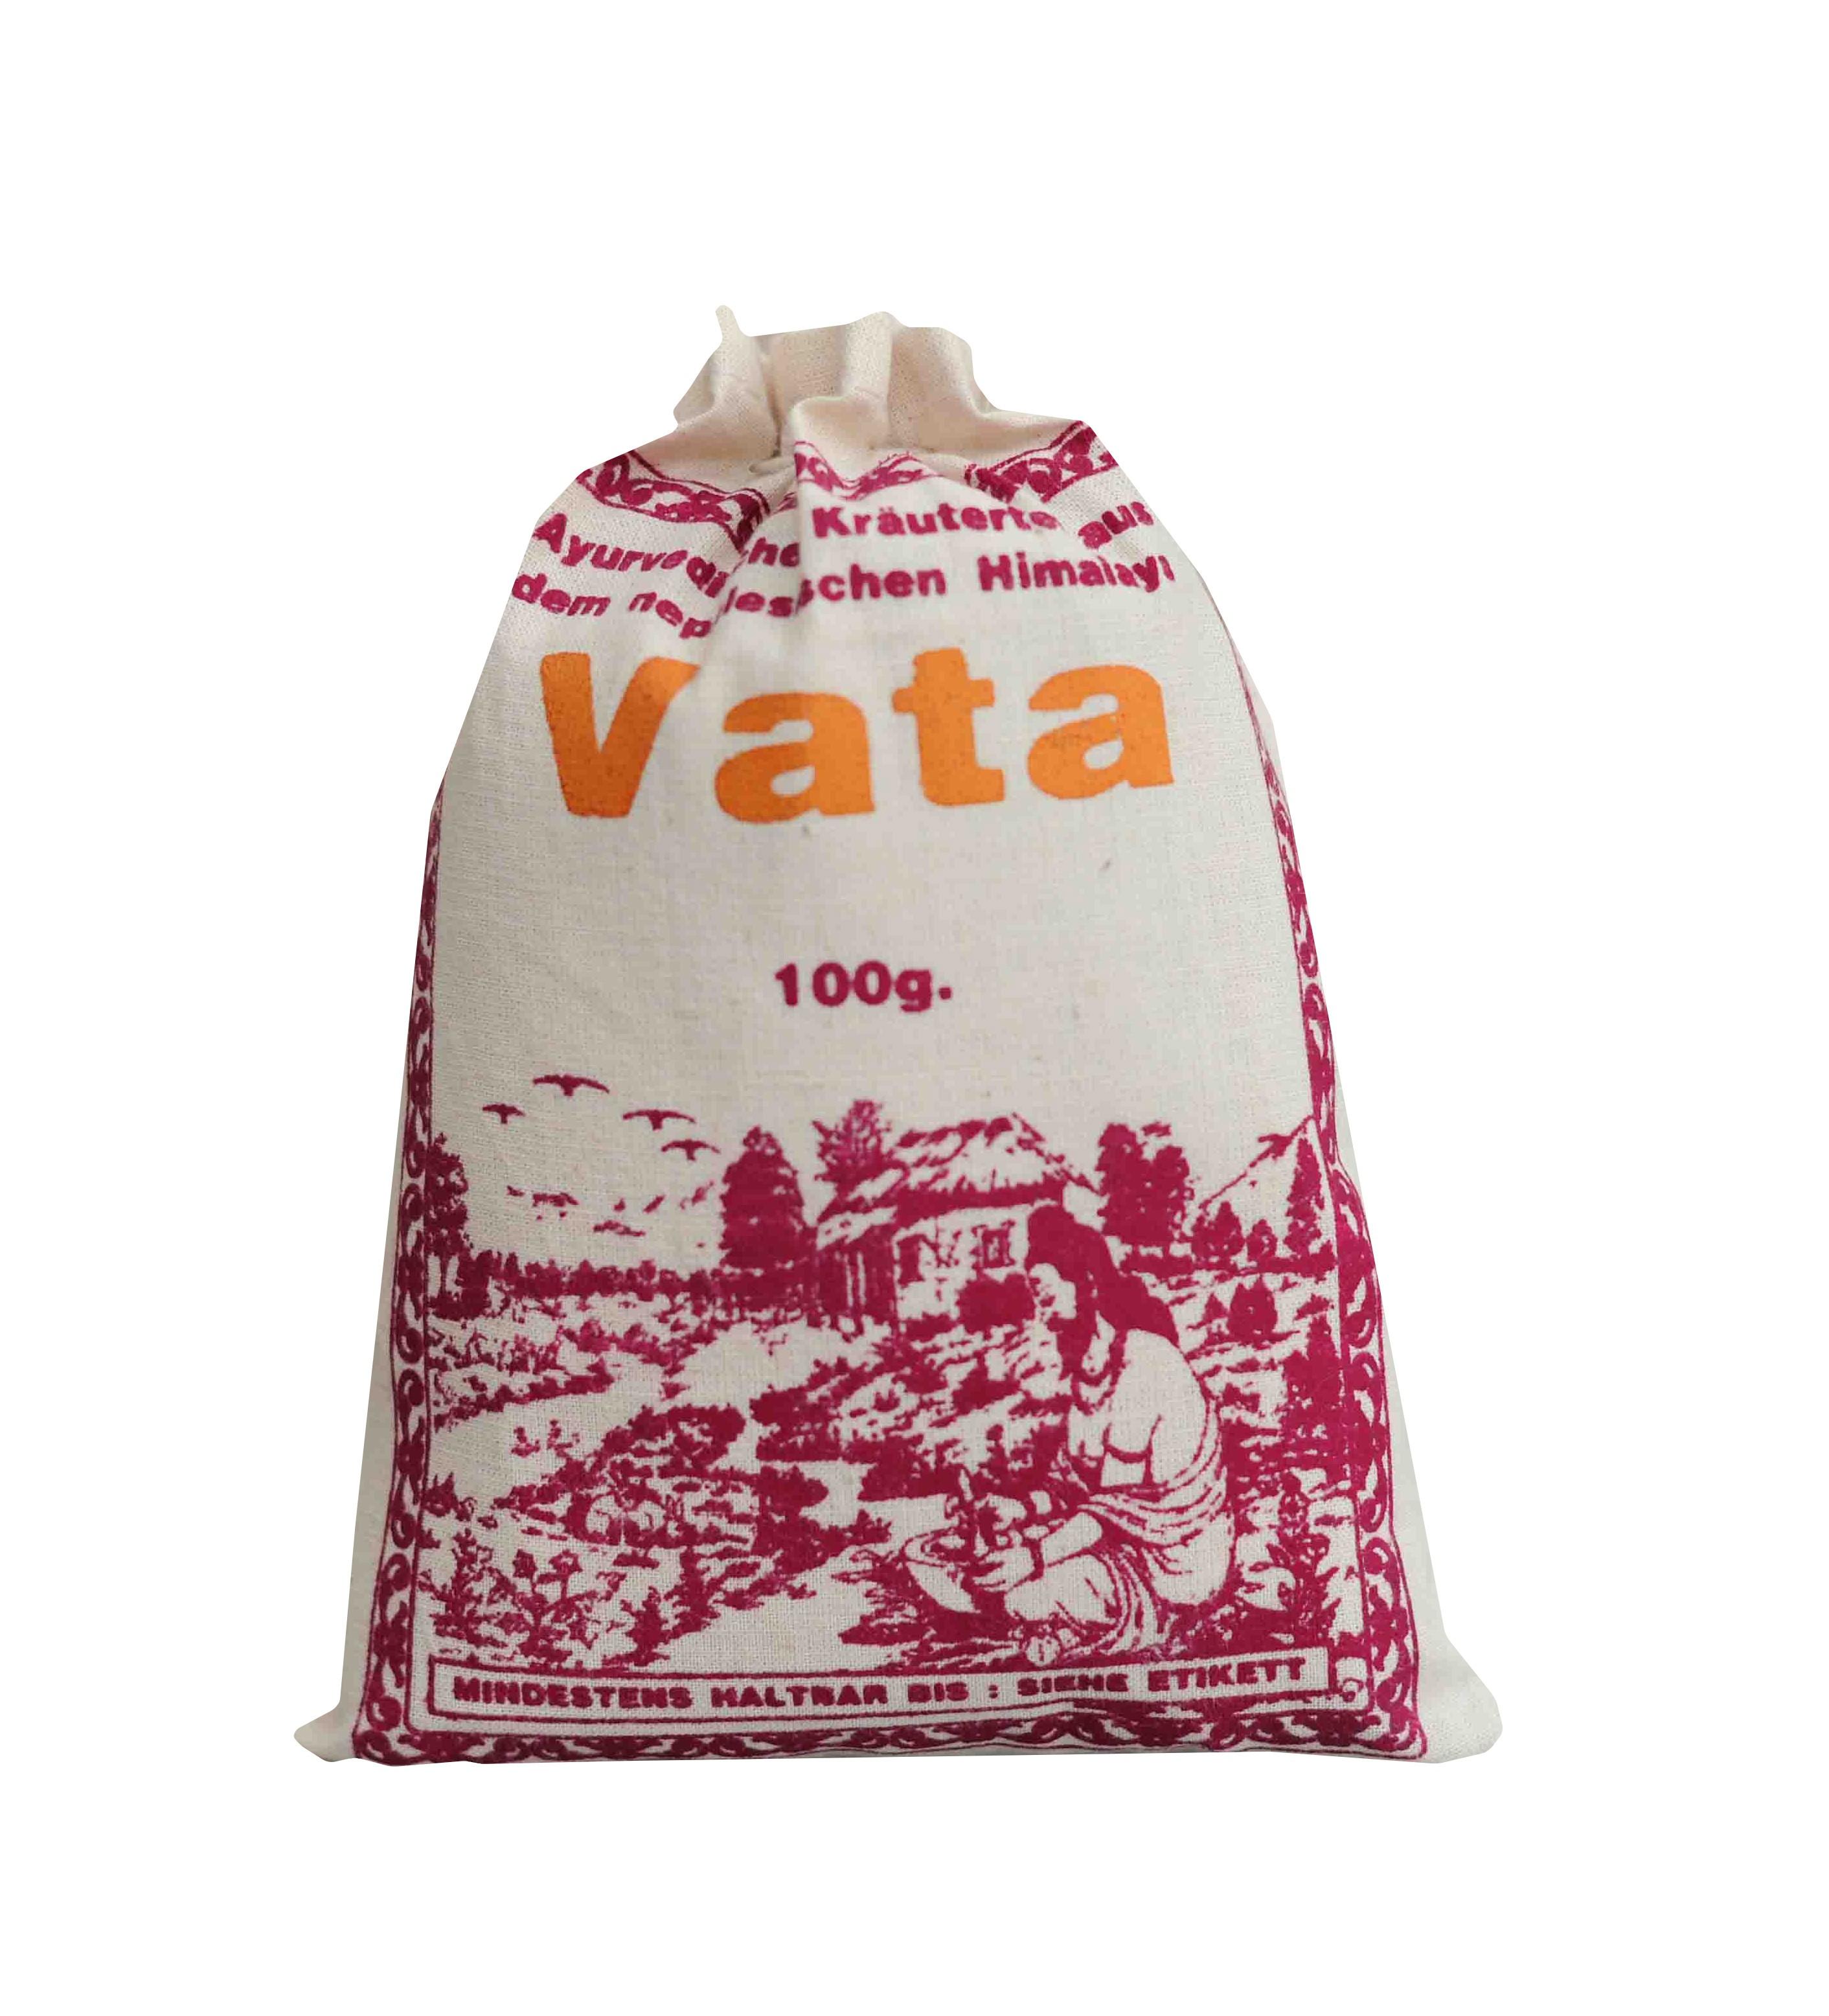 Tea from Nepal - Ayurveda Vata tea blend - 100g